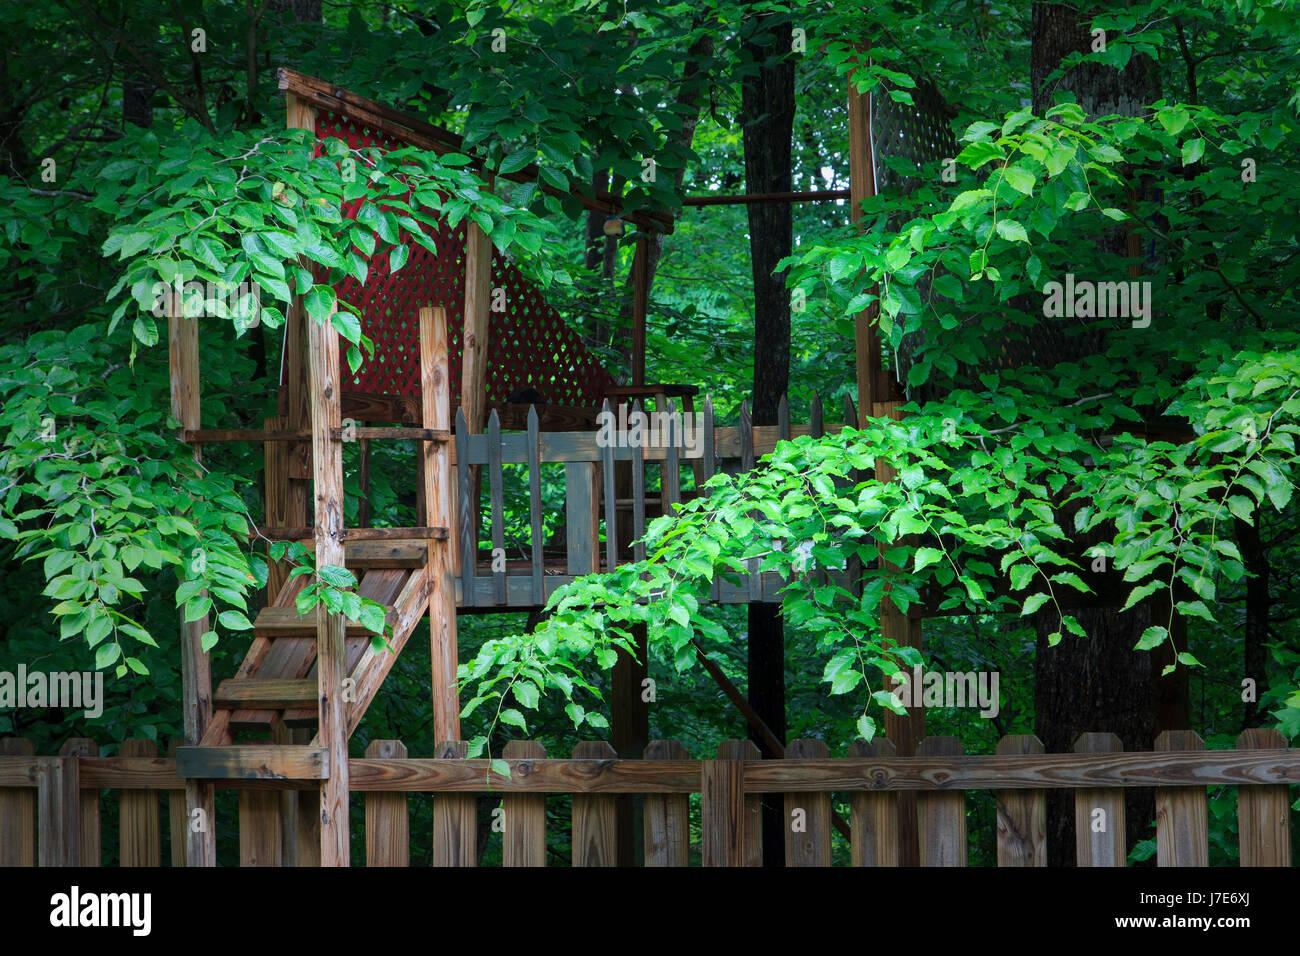 Backyard Tree house in woods - Stock Image